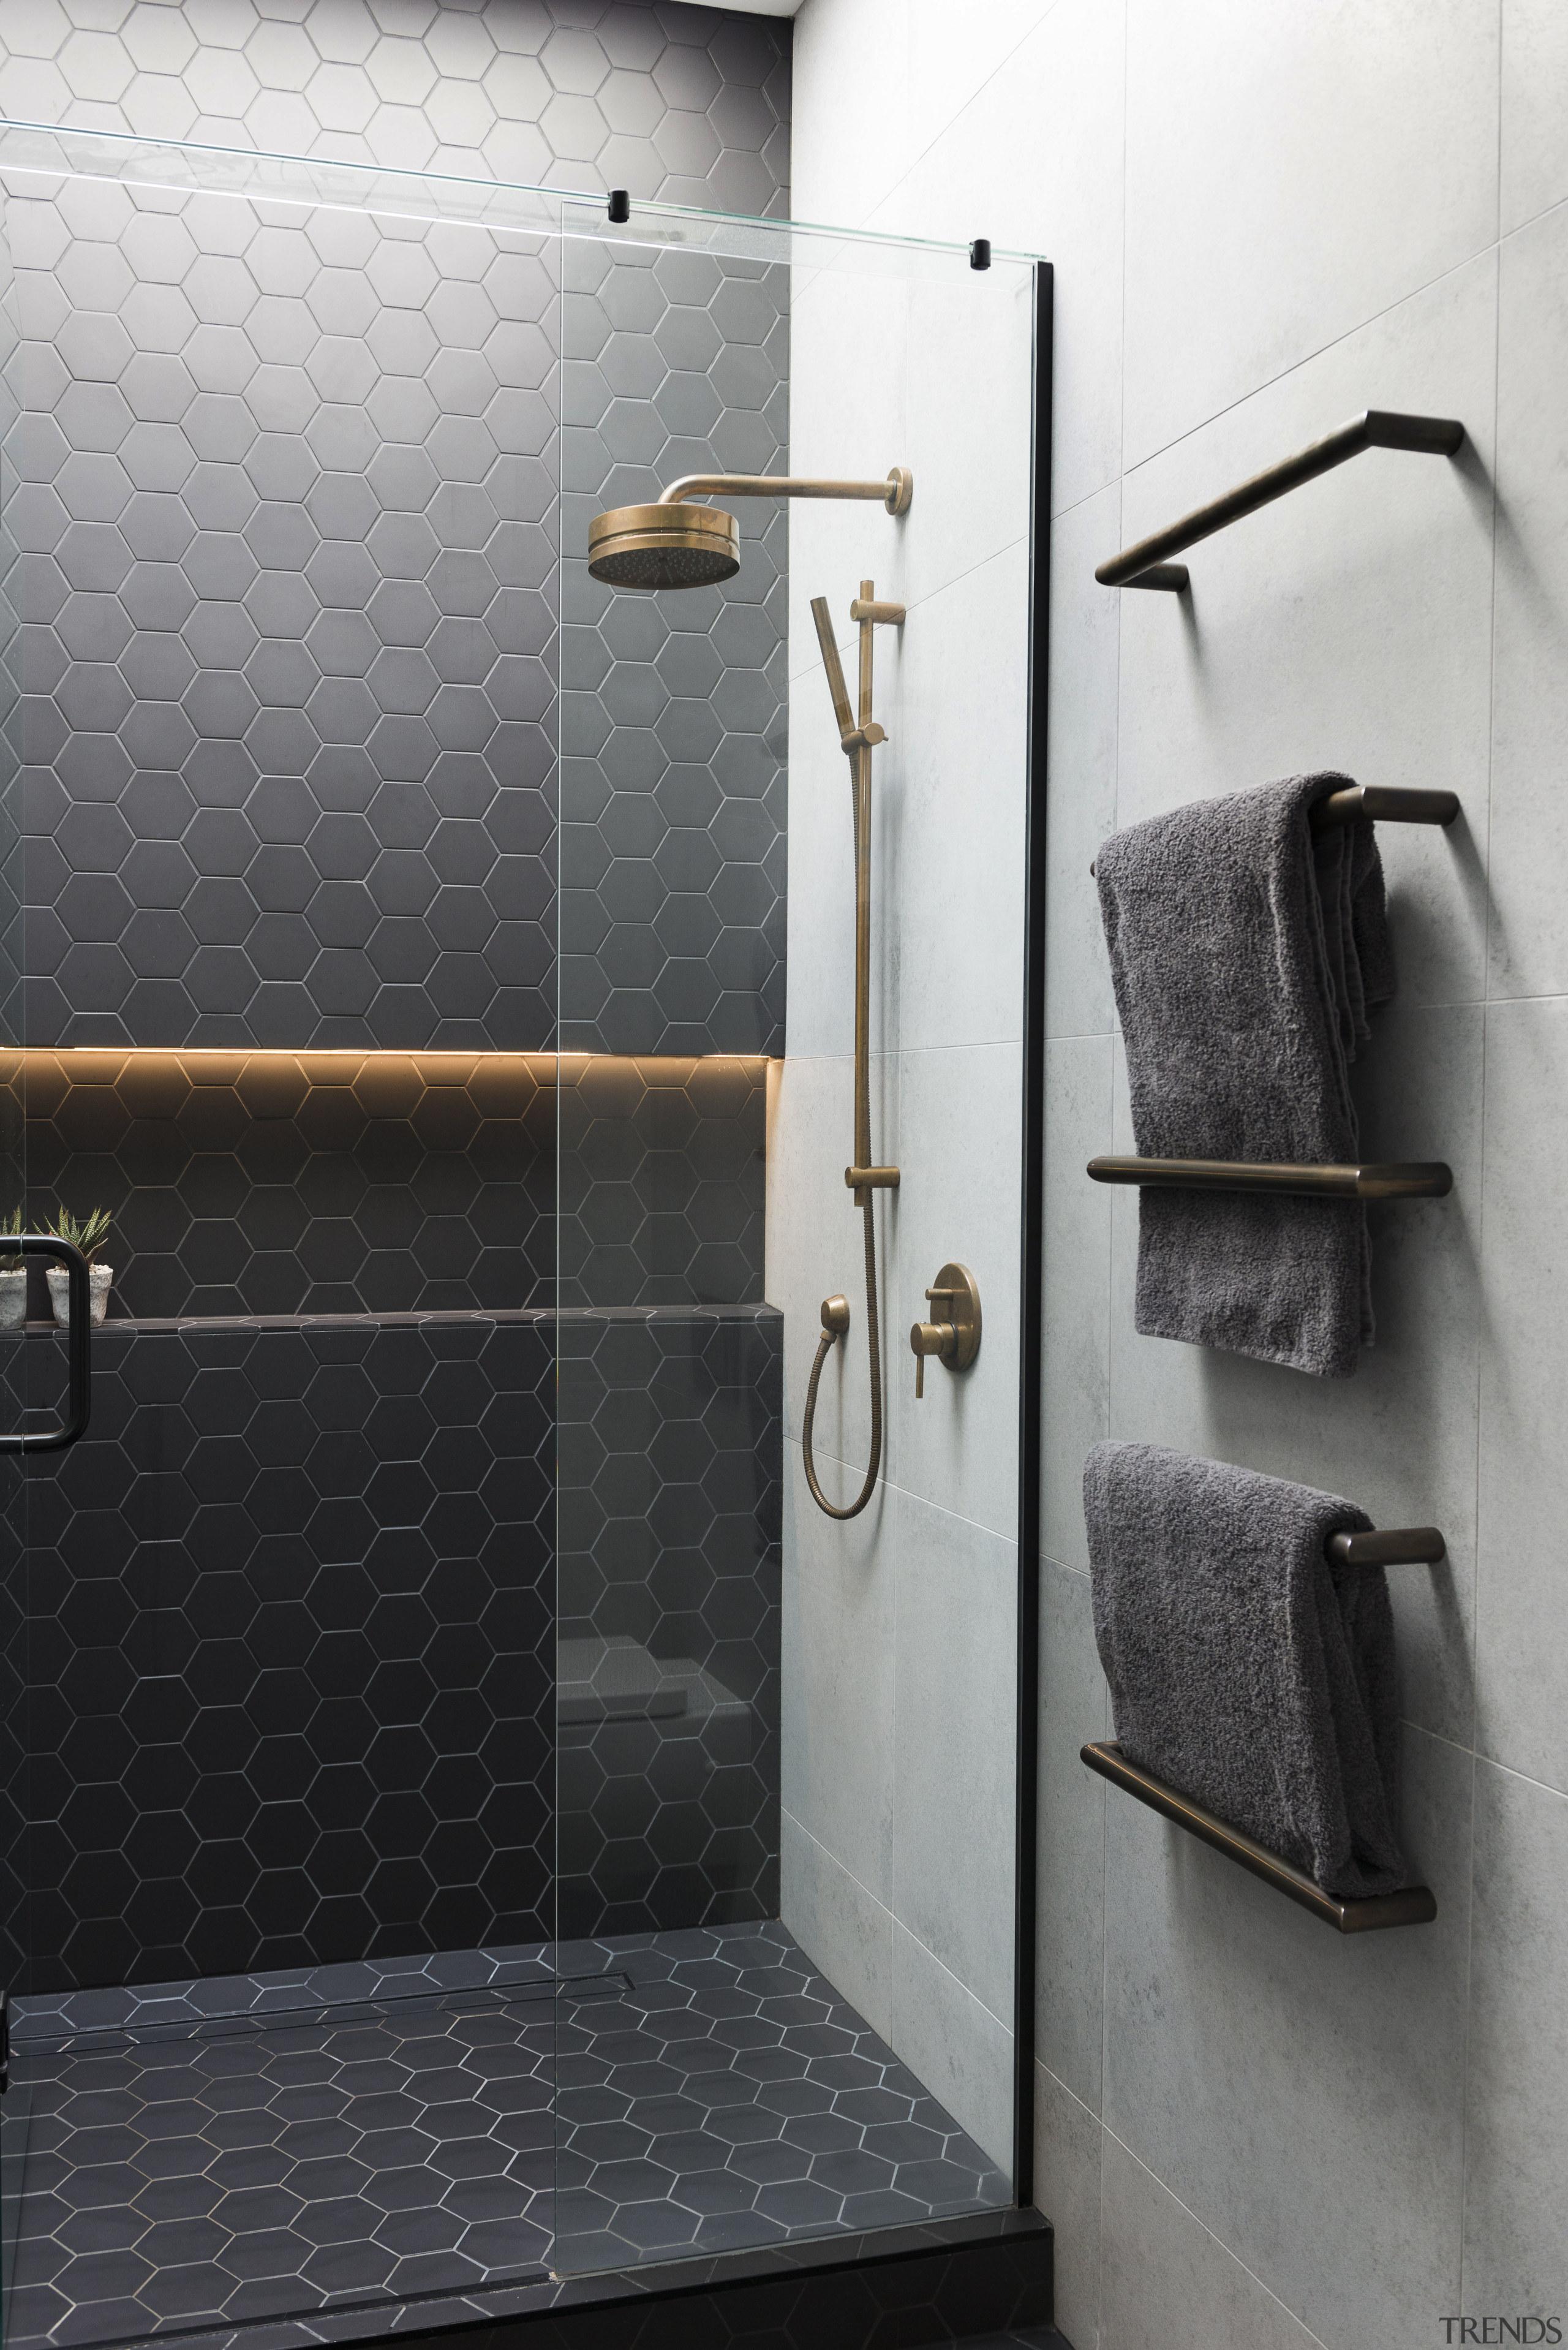 An LED-lit shower niche and under-vanity lighting add bathroom, floor, flooring, plumbing fixture, product design, room, tap, tile, wall, black, gray